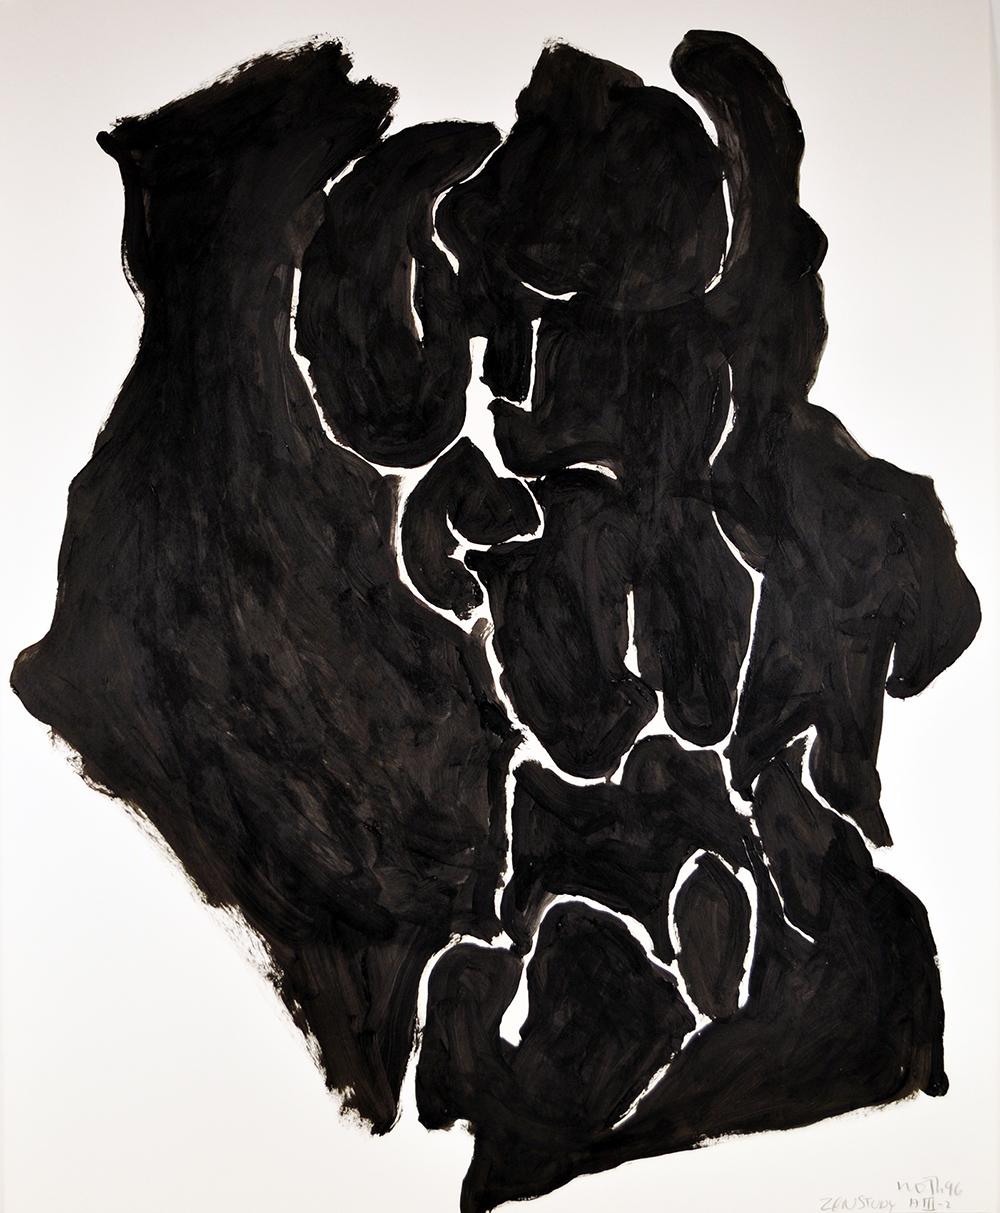 #421 Zen Study AIII-2,   Acrylic on paper, 1996, 40 x 32 inches